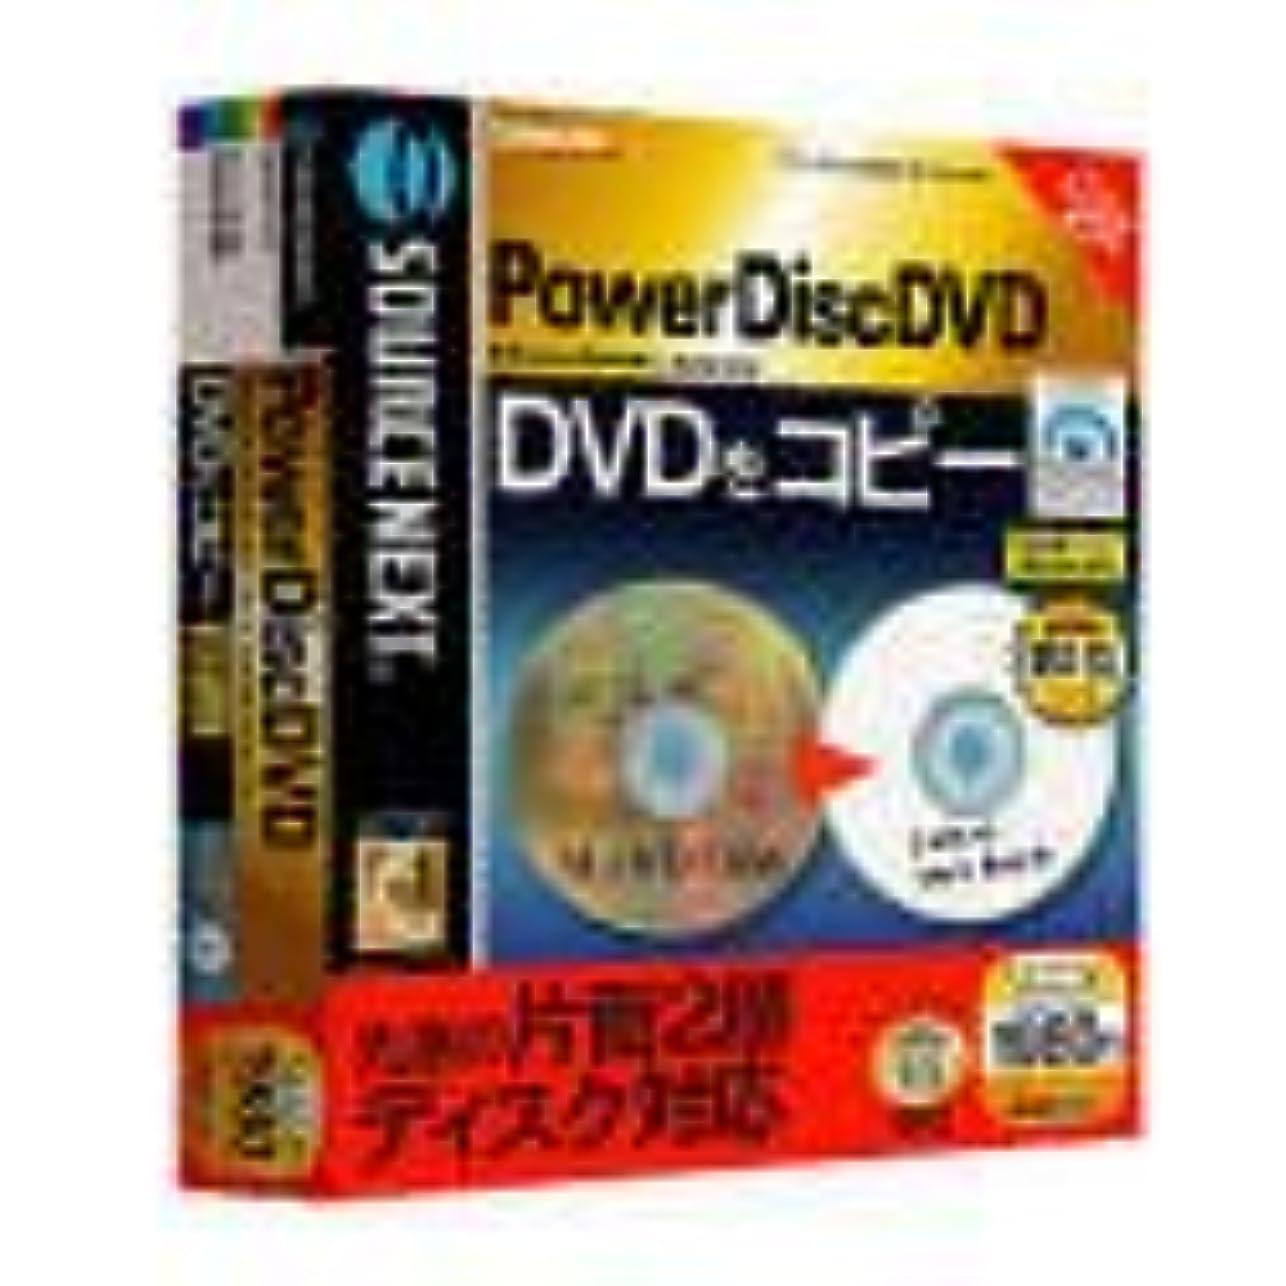 PowerDiscDVD DoubleLayer